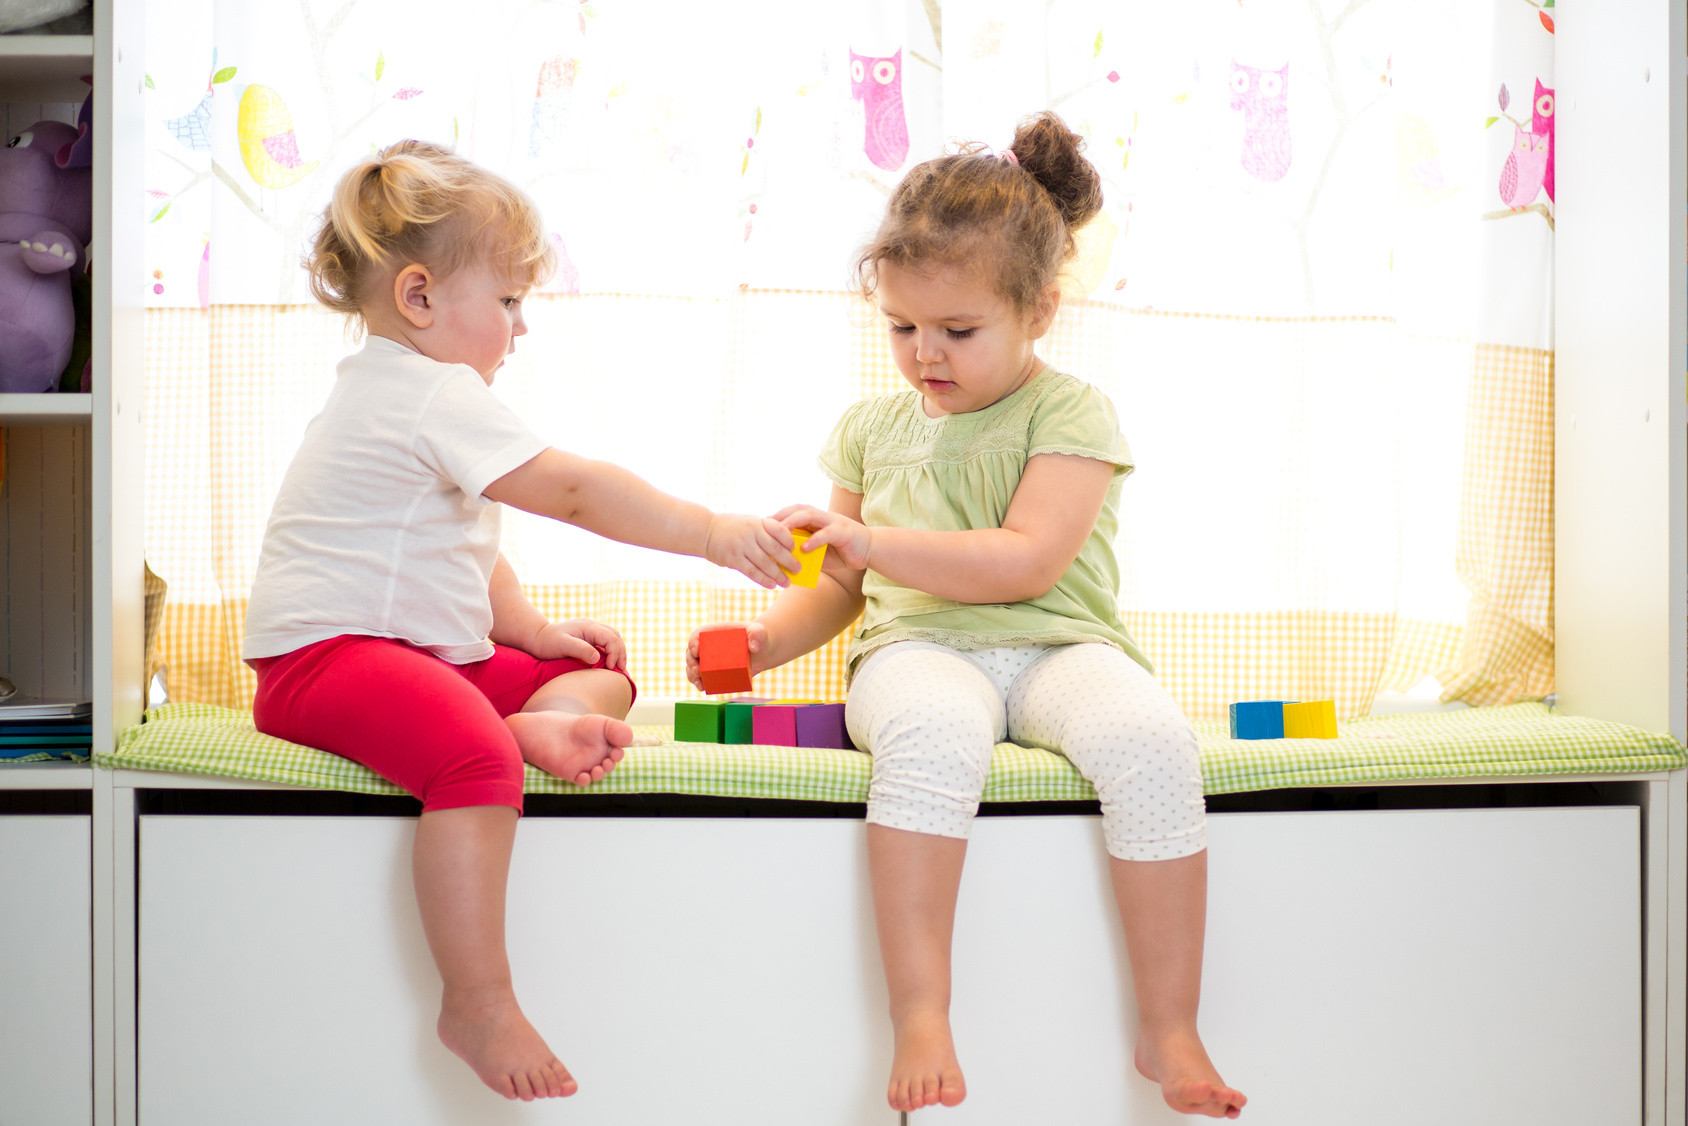 деца, споделят, играчки, споделяне